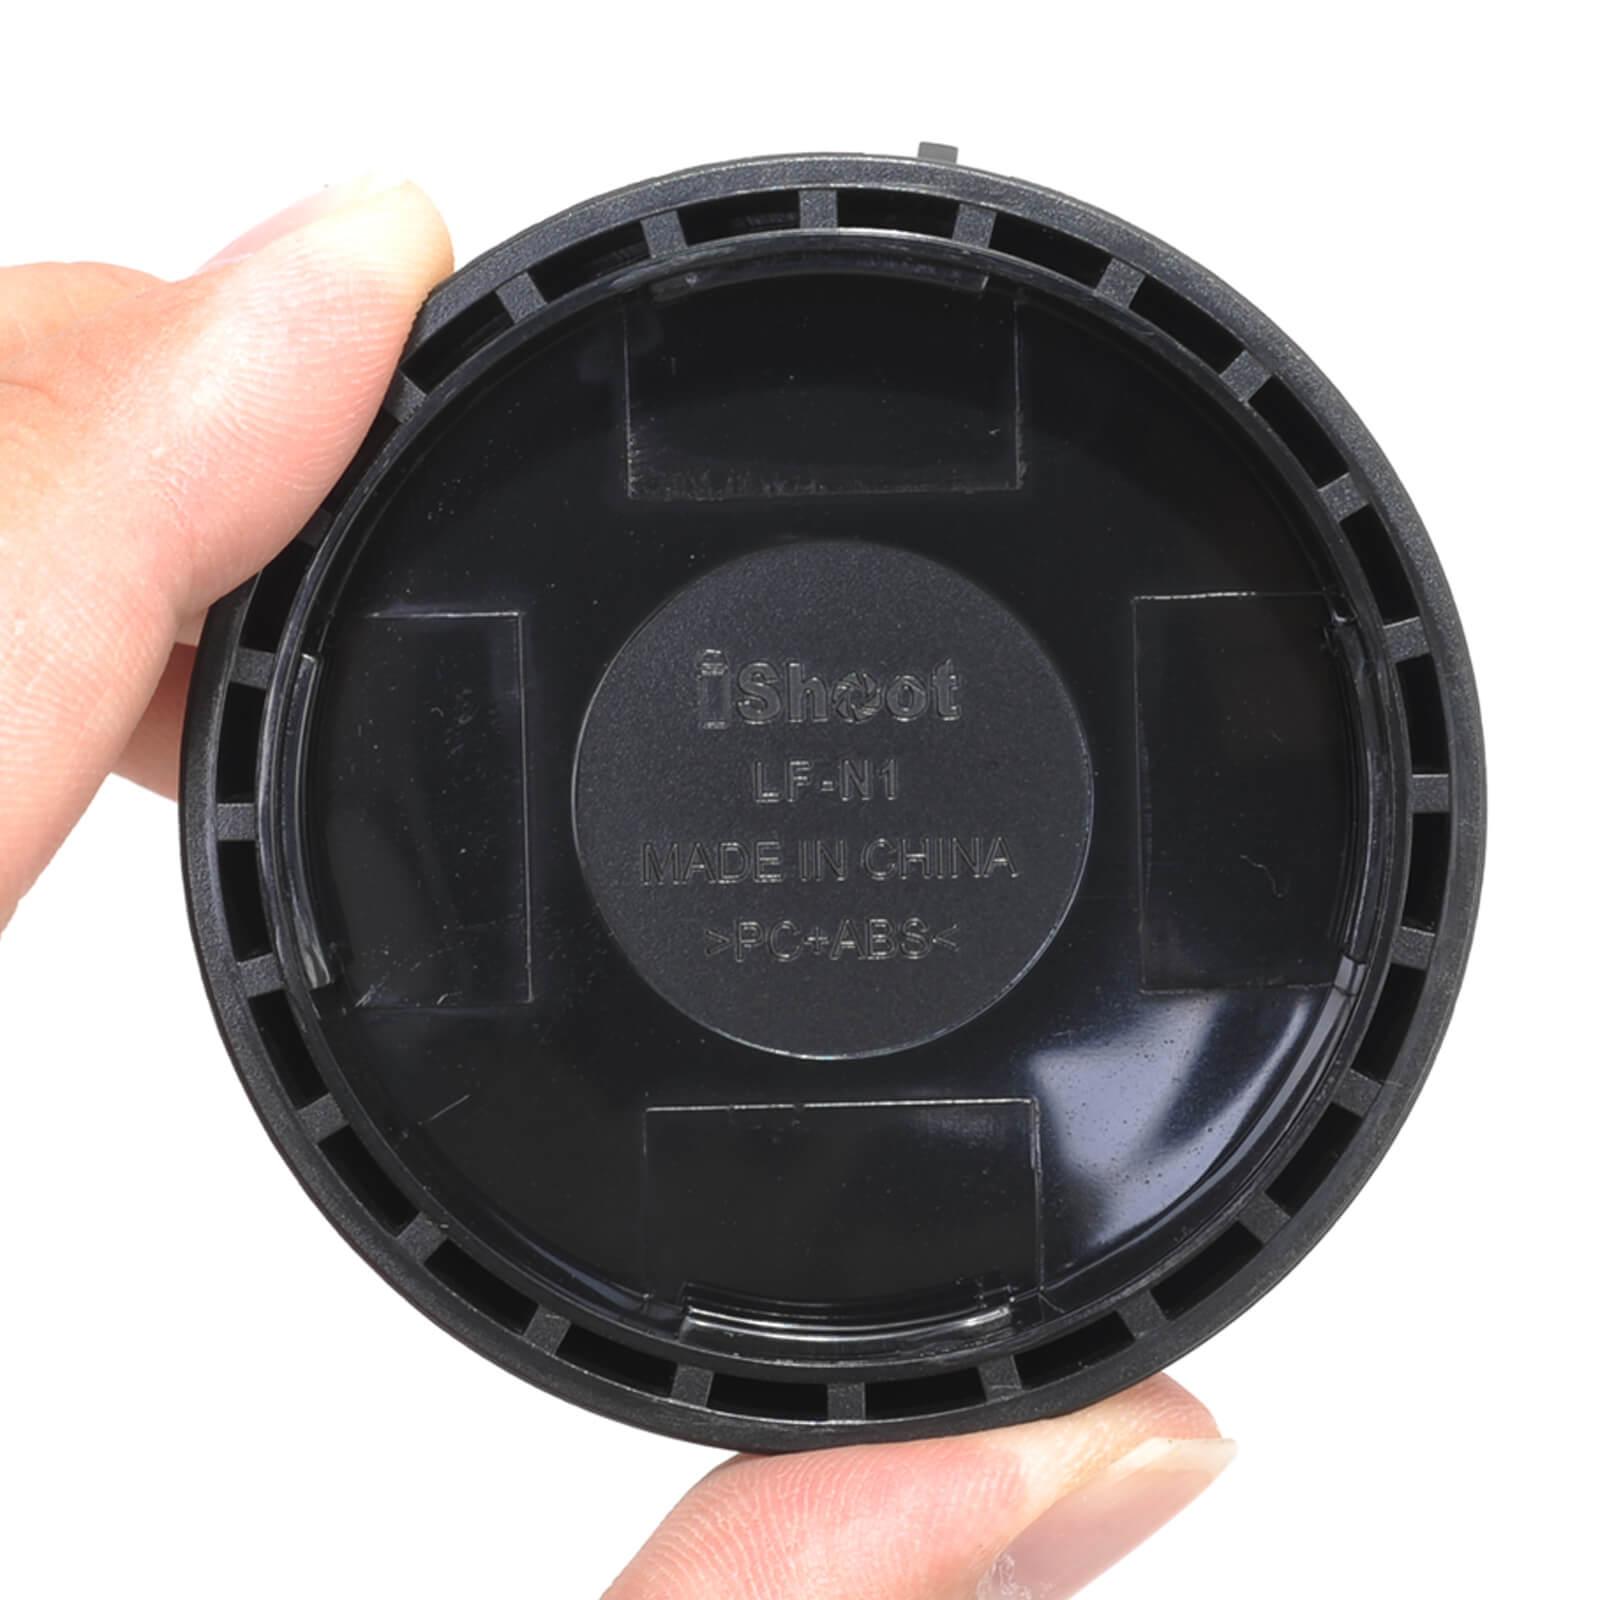 Professional Nikon Rear Lens Cap Cover for Nikon NIKKOR Z 58mm F0.95 S Noct Lens